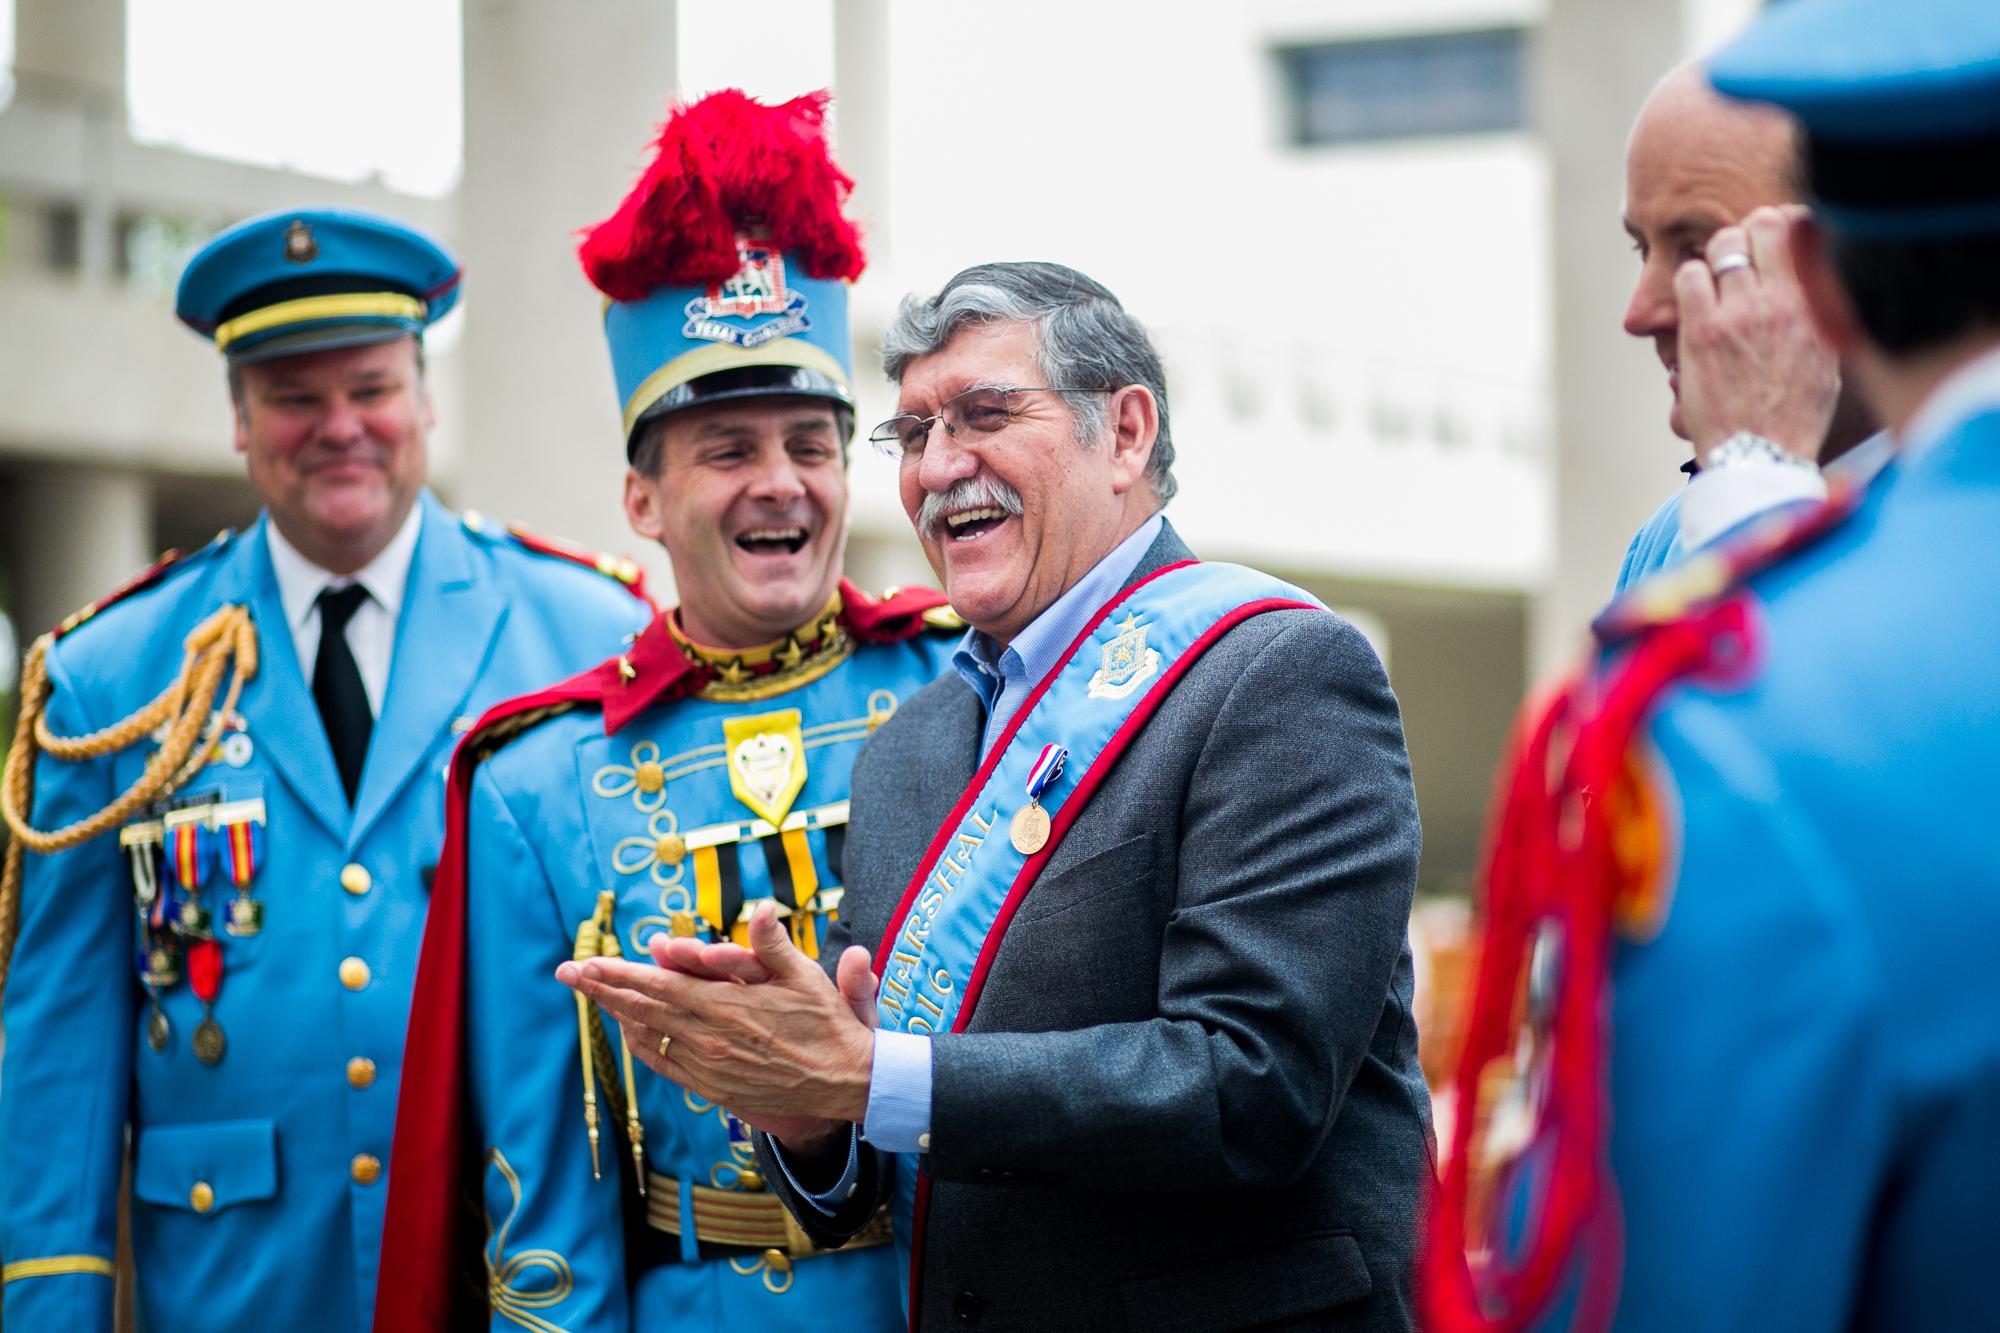 UTSA President Dr. Ricardo Romo shares a laugh with The Texas Cavaliers. Photo by Kathryn Boyd-Batstone